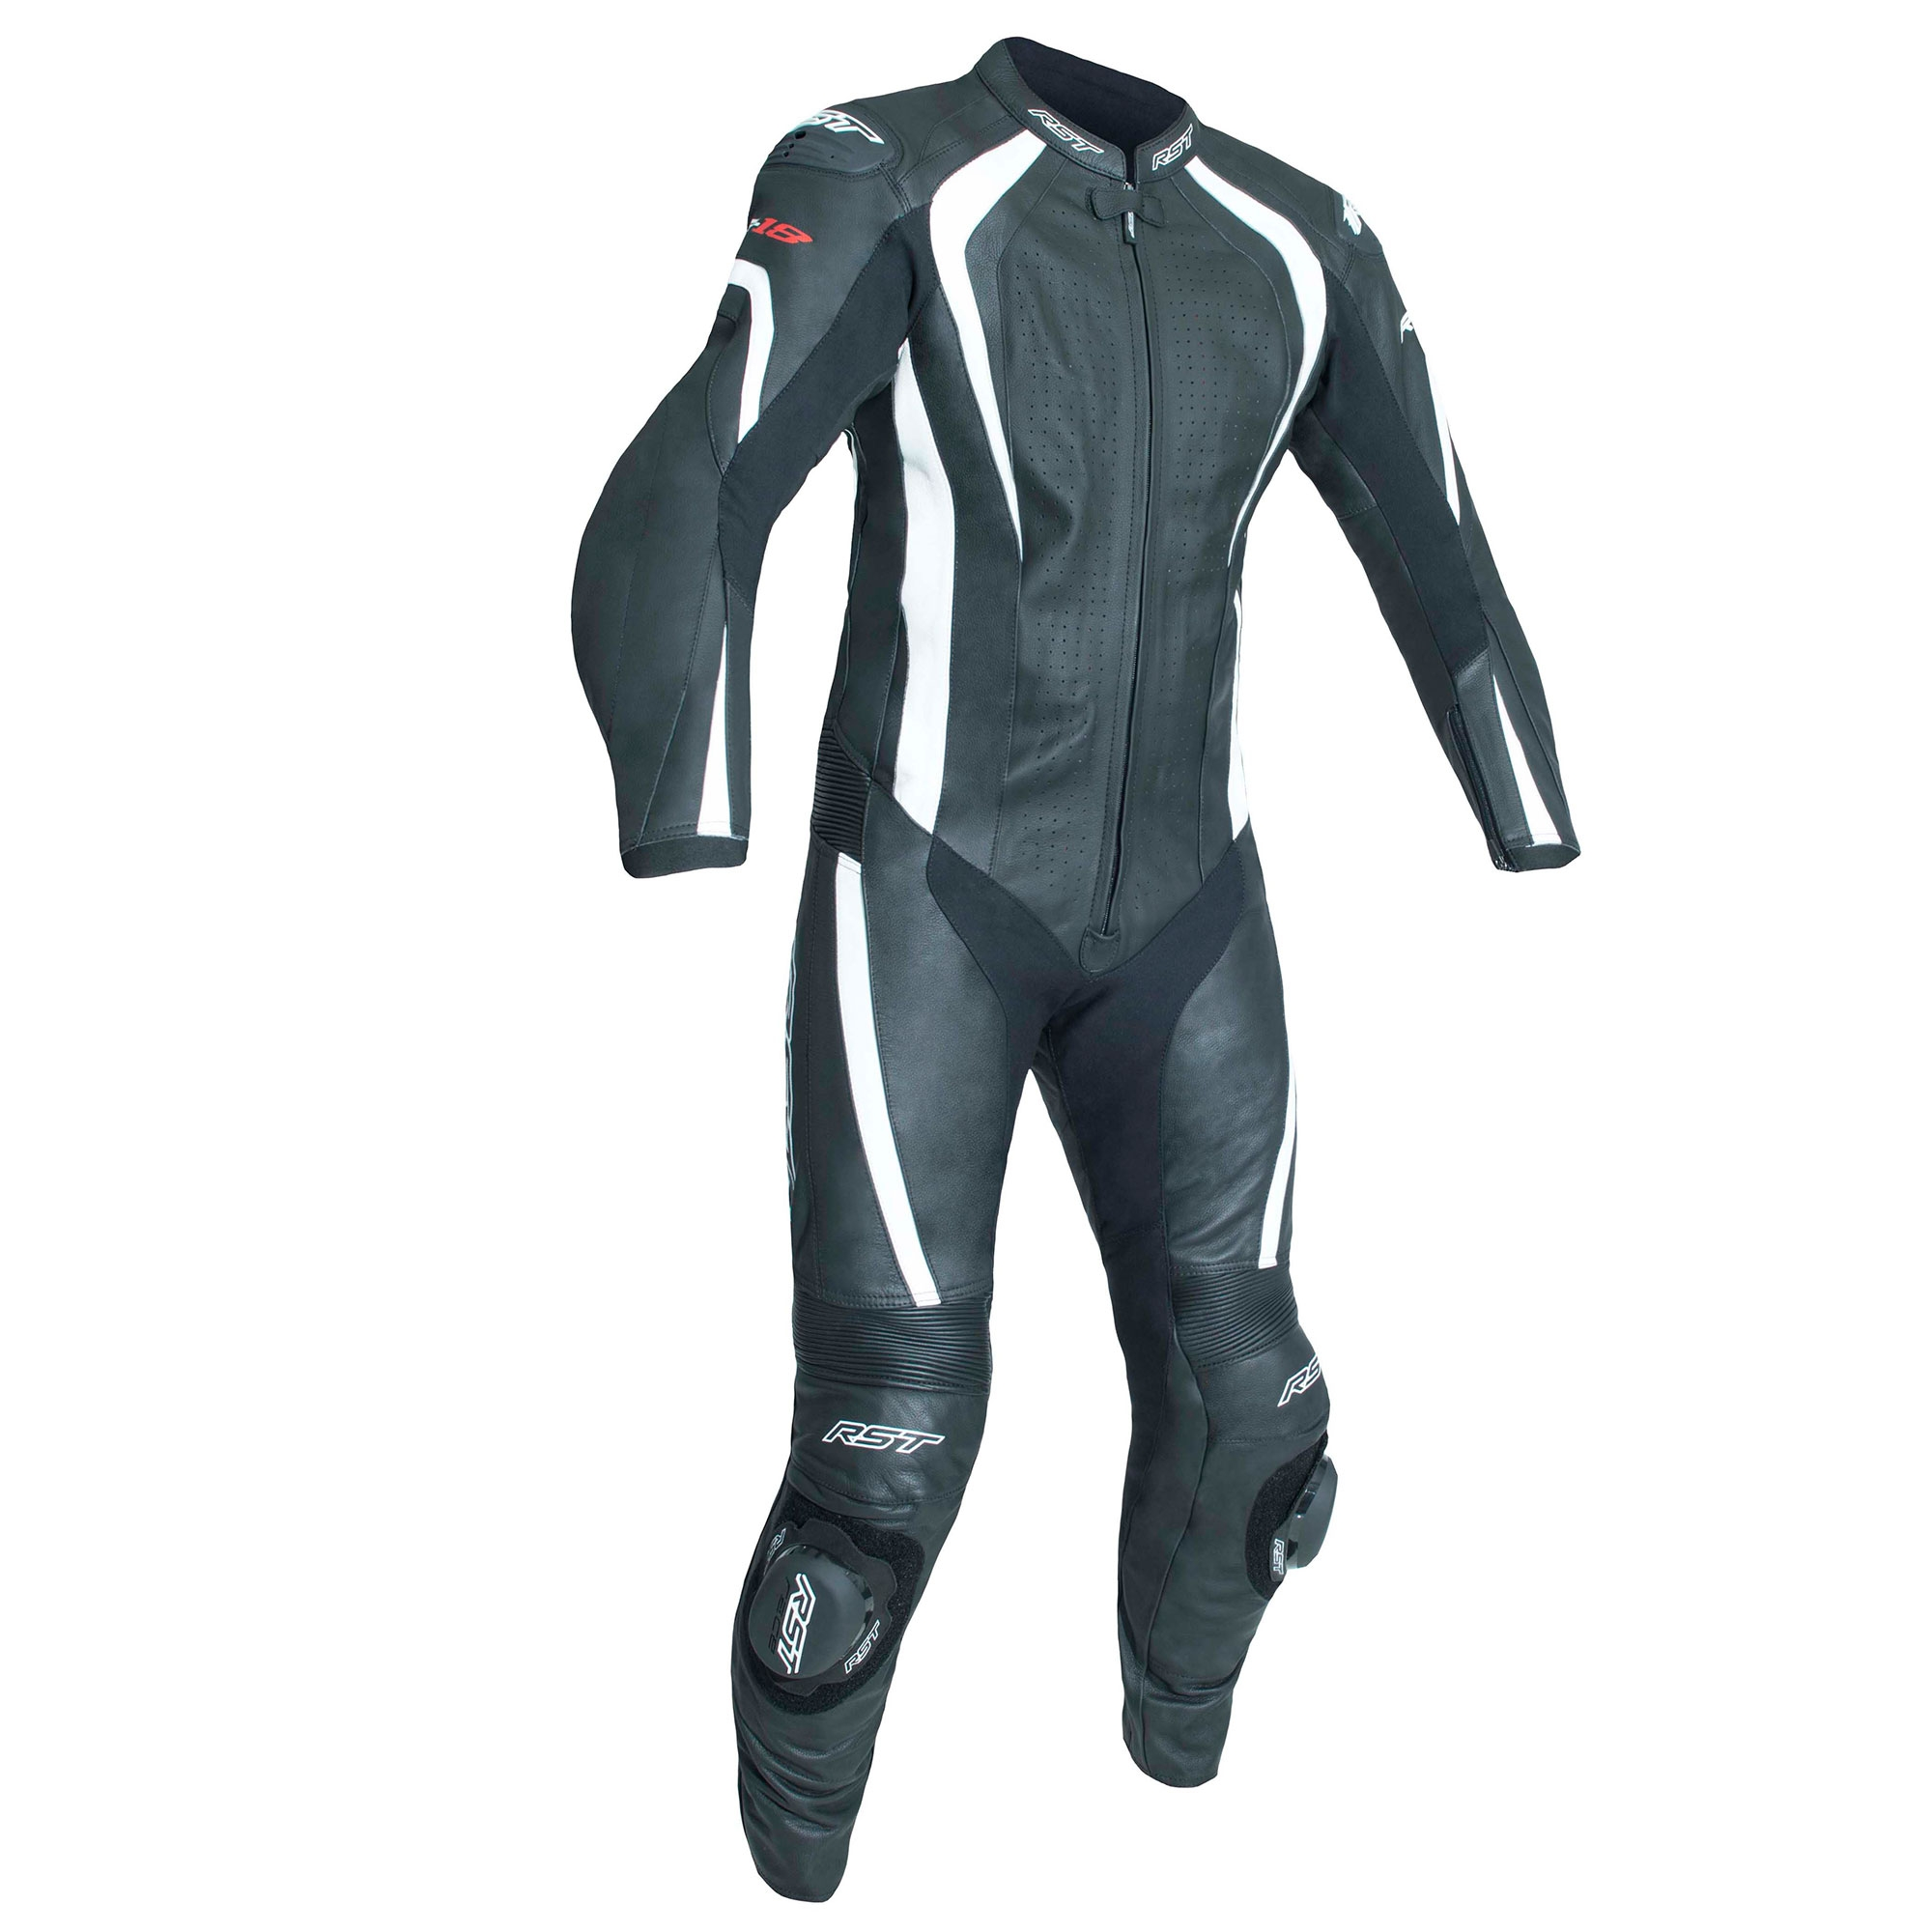 Best Quality Men/'s 1PC One piece Back Armor Motorcycle Biker Jacket